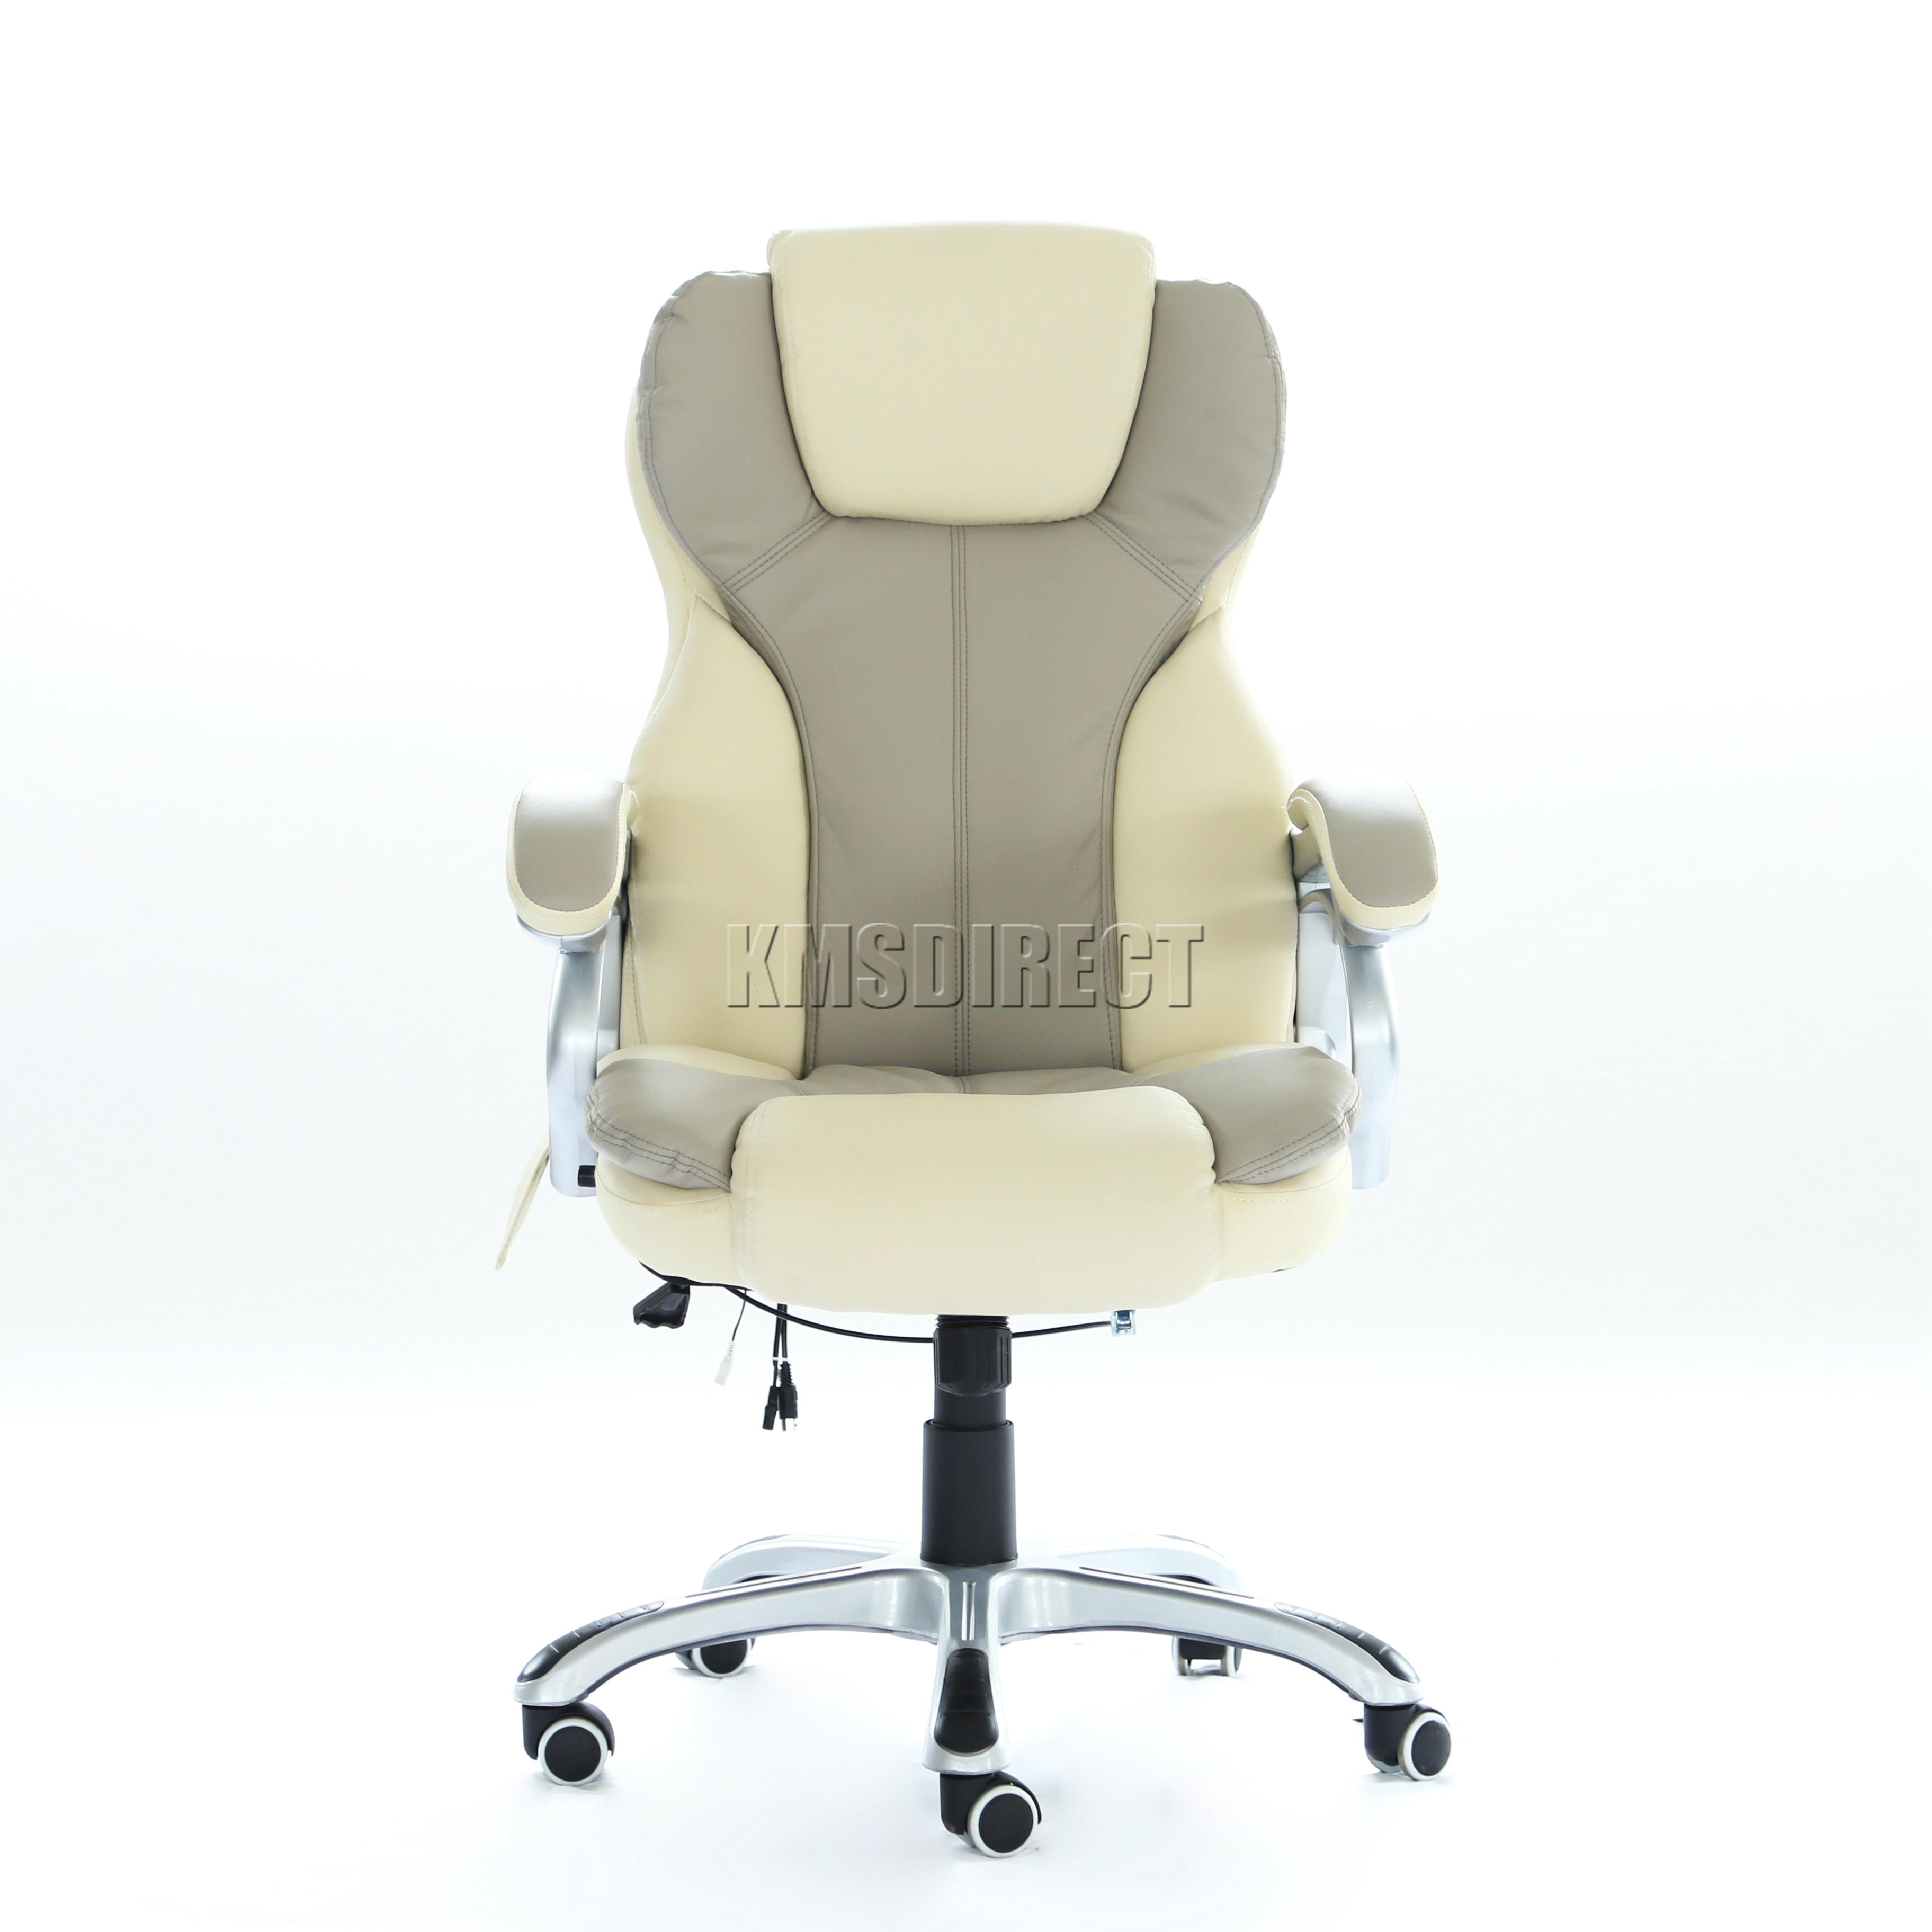 Westwood luxury 6 point massage office computer chair for Silla de computadora